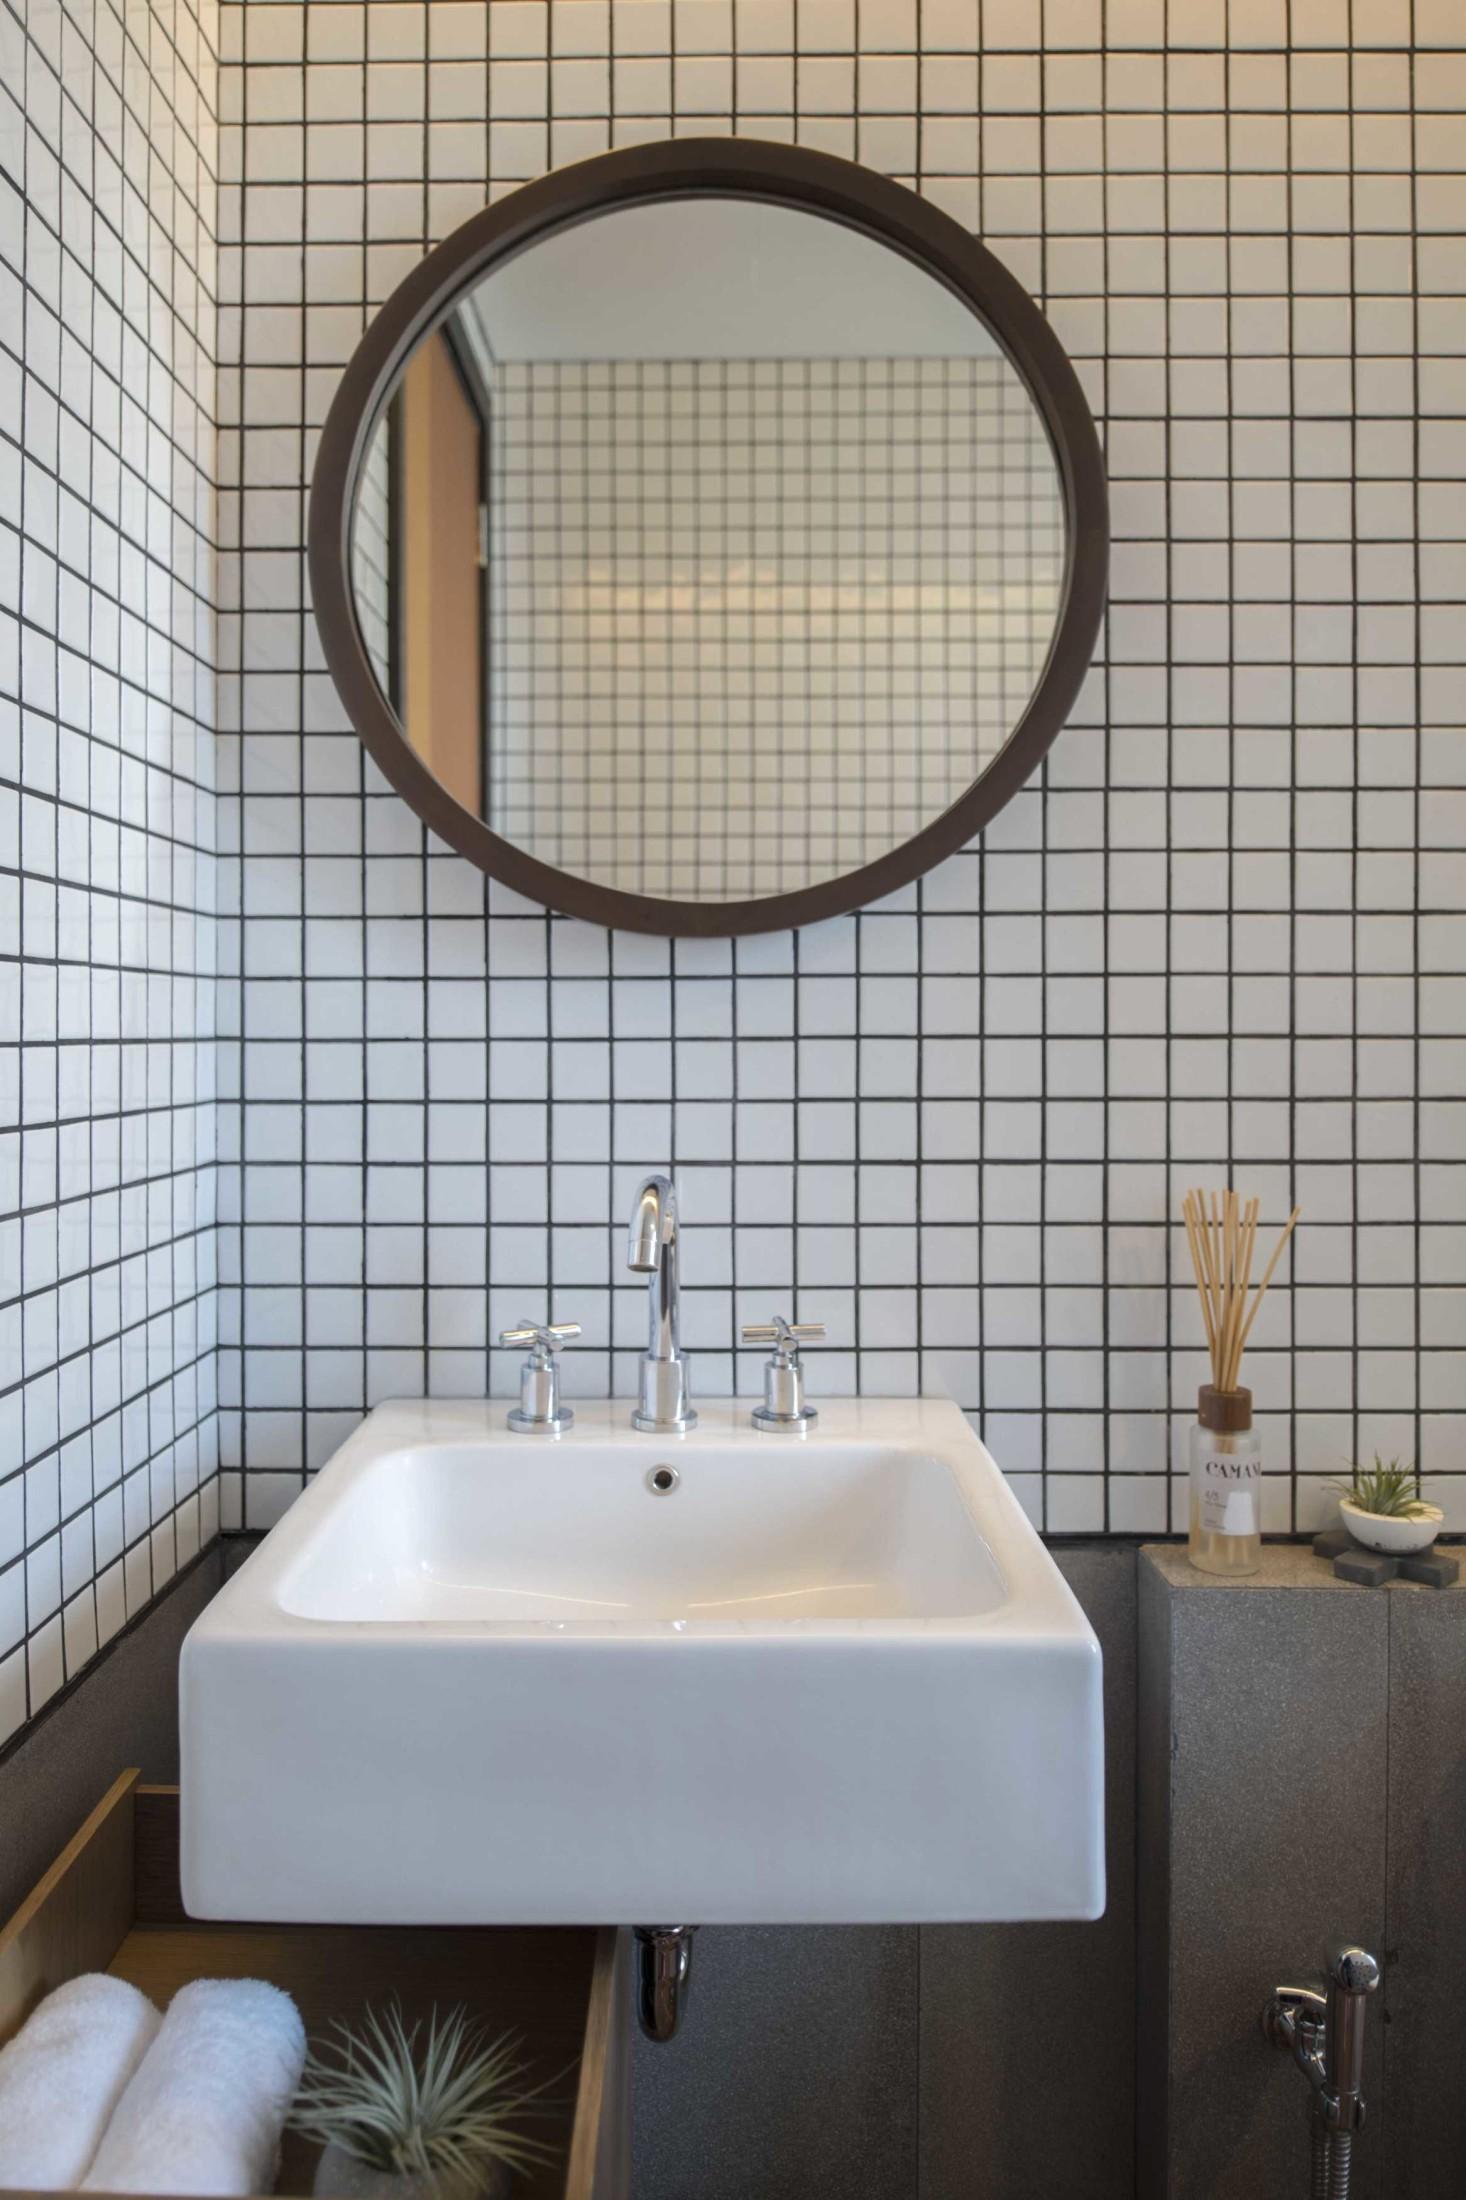 Perpaduan bentuk kotak dan lingkaran menciptakan kesan minimalis yang dinamis (Sumber: arsitag.com)